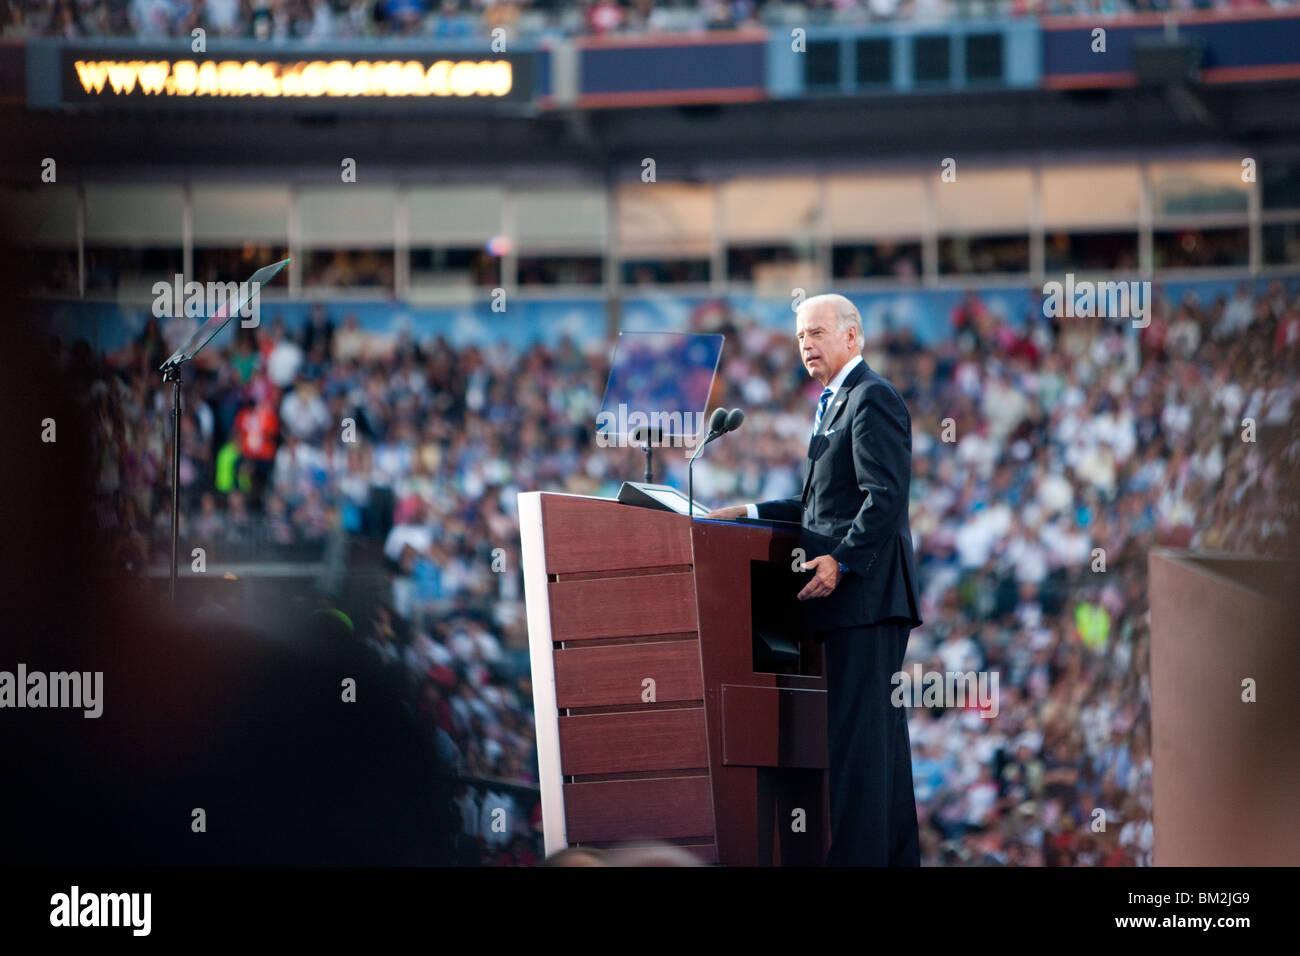 Joe Biden Speech at Invesco - Stock Image